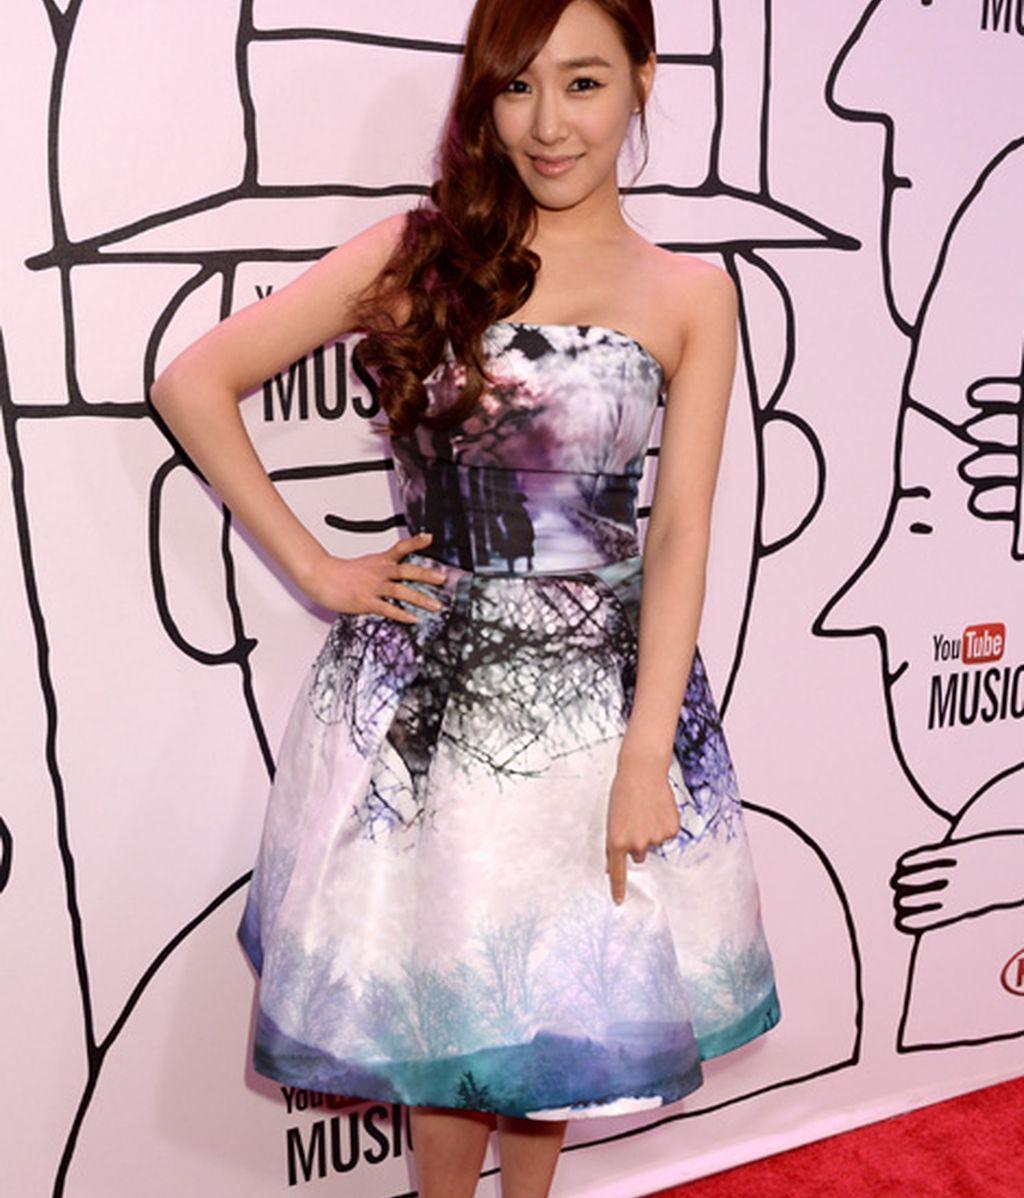 Tiffany de Girls' generation